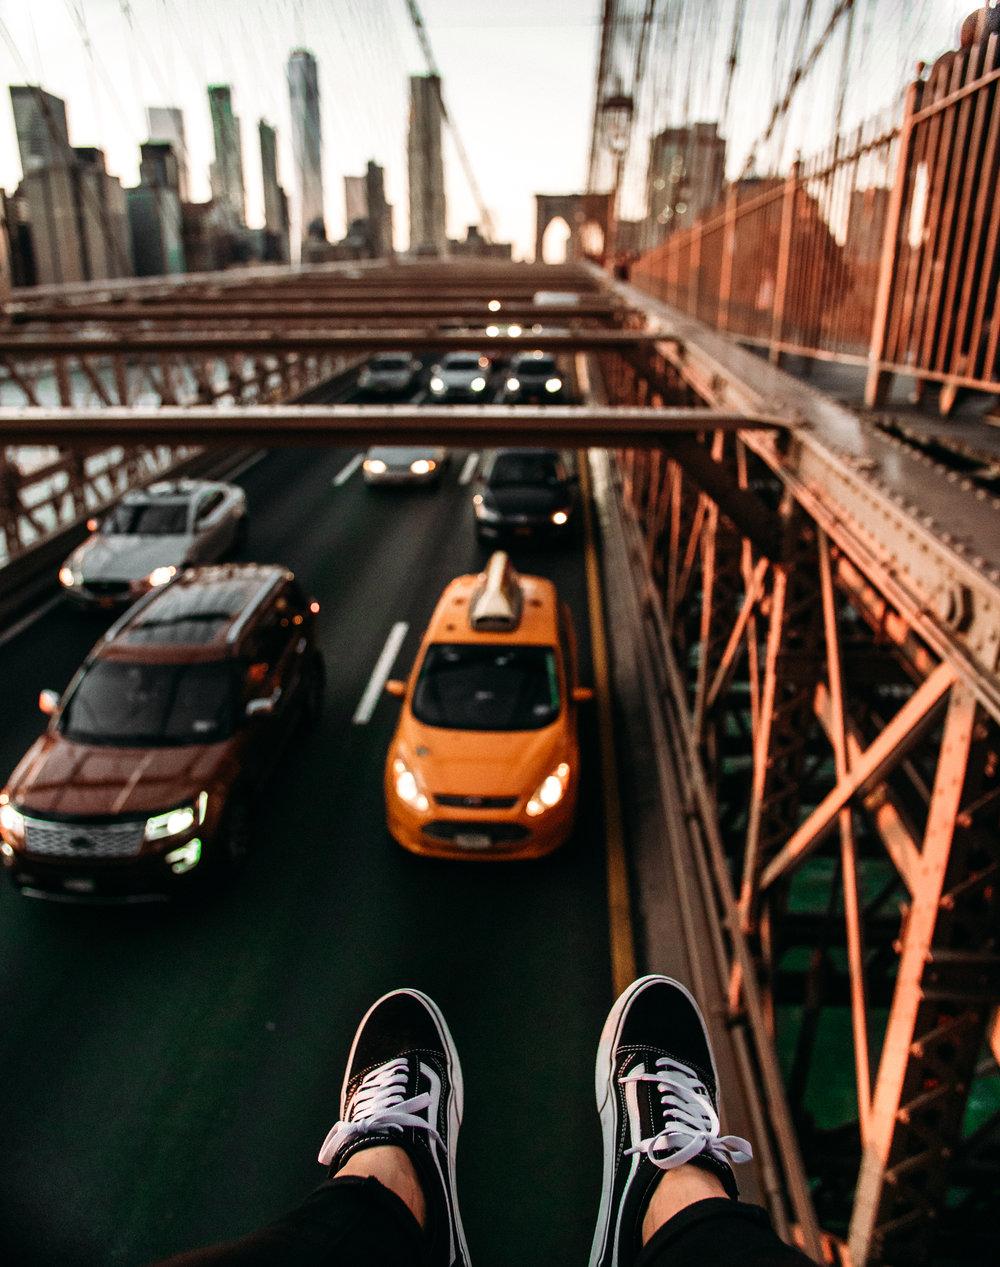 BROOKLYN_BRIDGE_NEW_YORK_CITY_USA